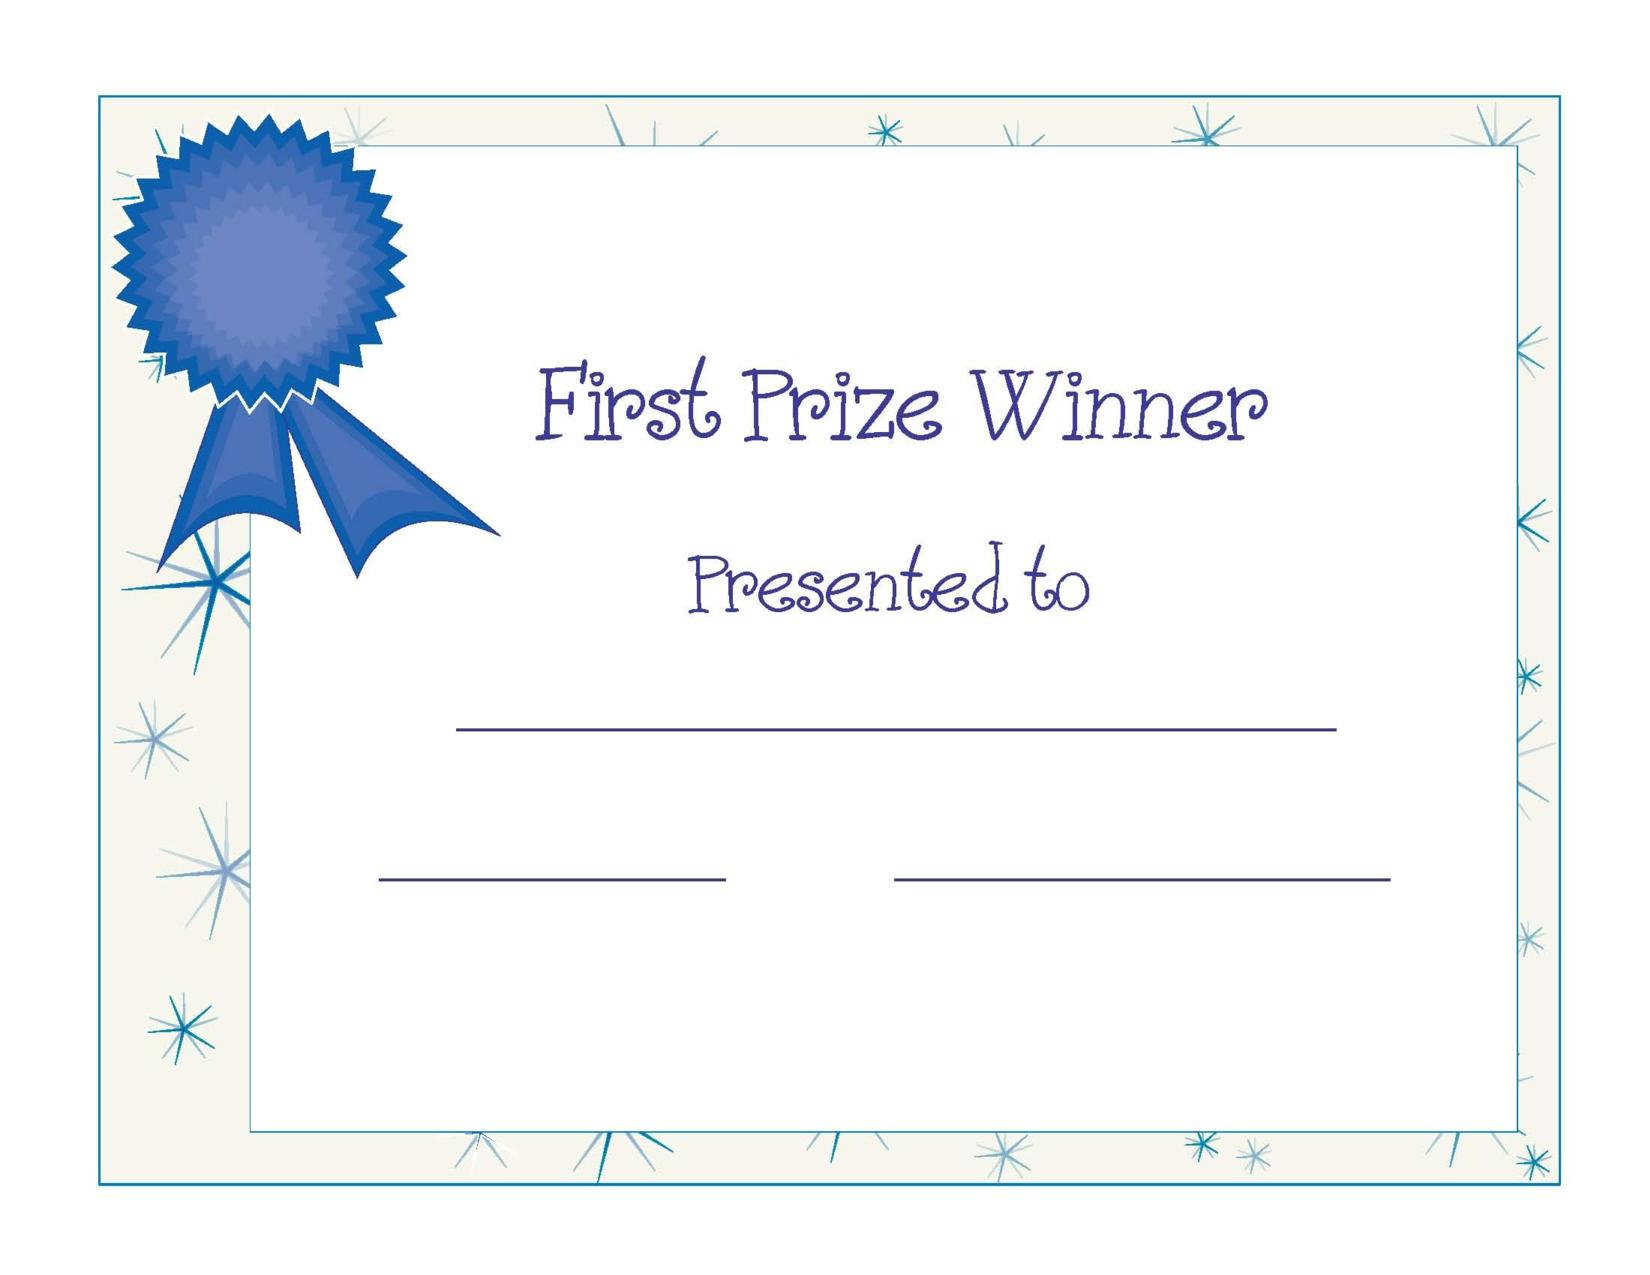 Free Printable Award Certificate Template | Free Printable First - Free Printable Student Award Certificate Template